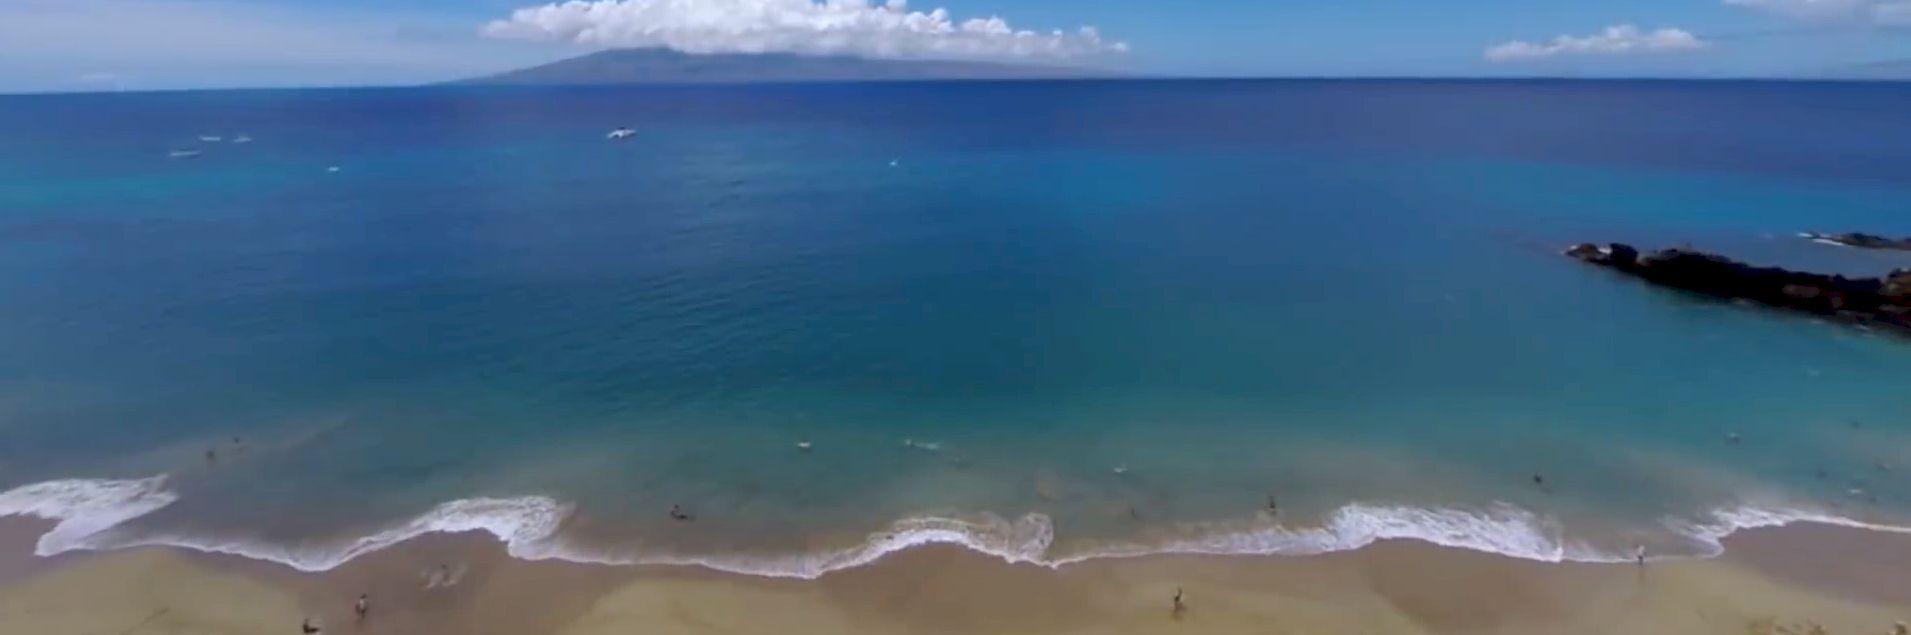 westin-nanea-ocean-villas-slider1